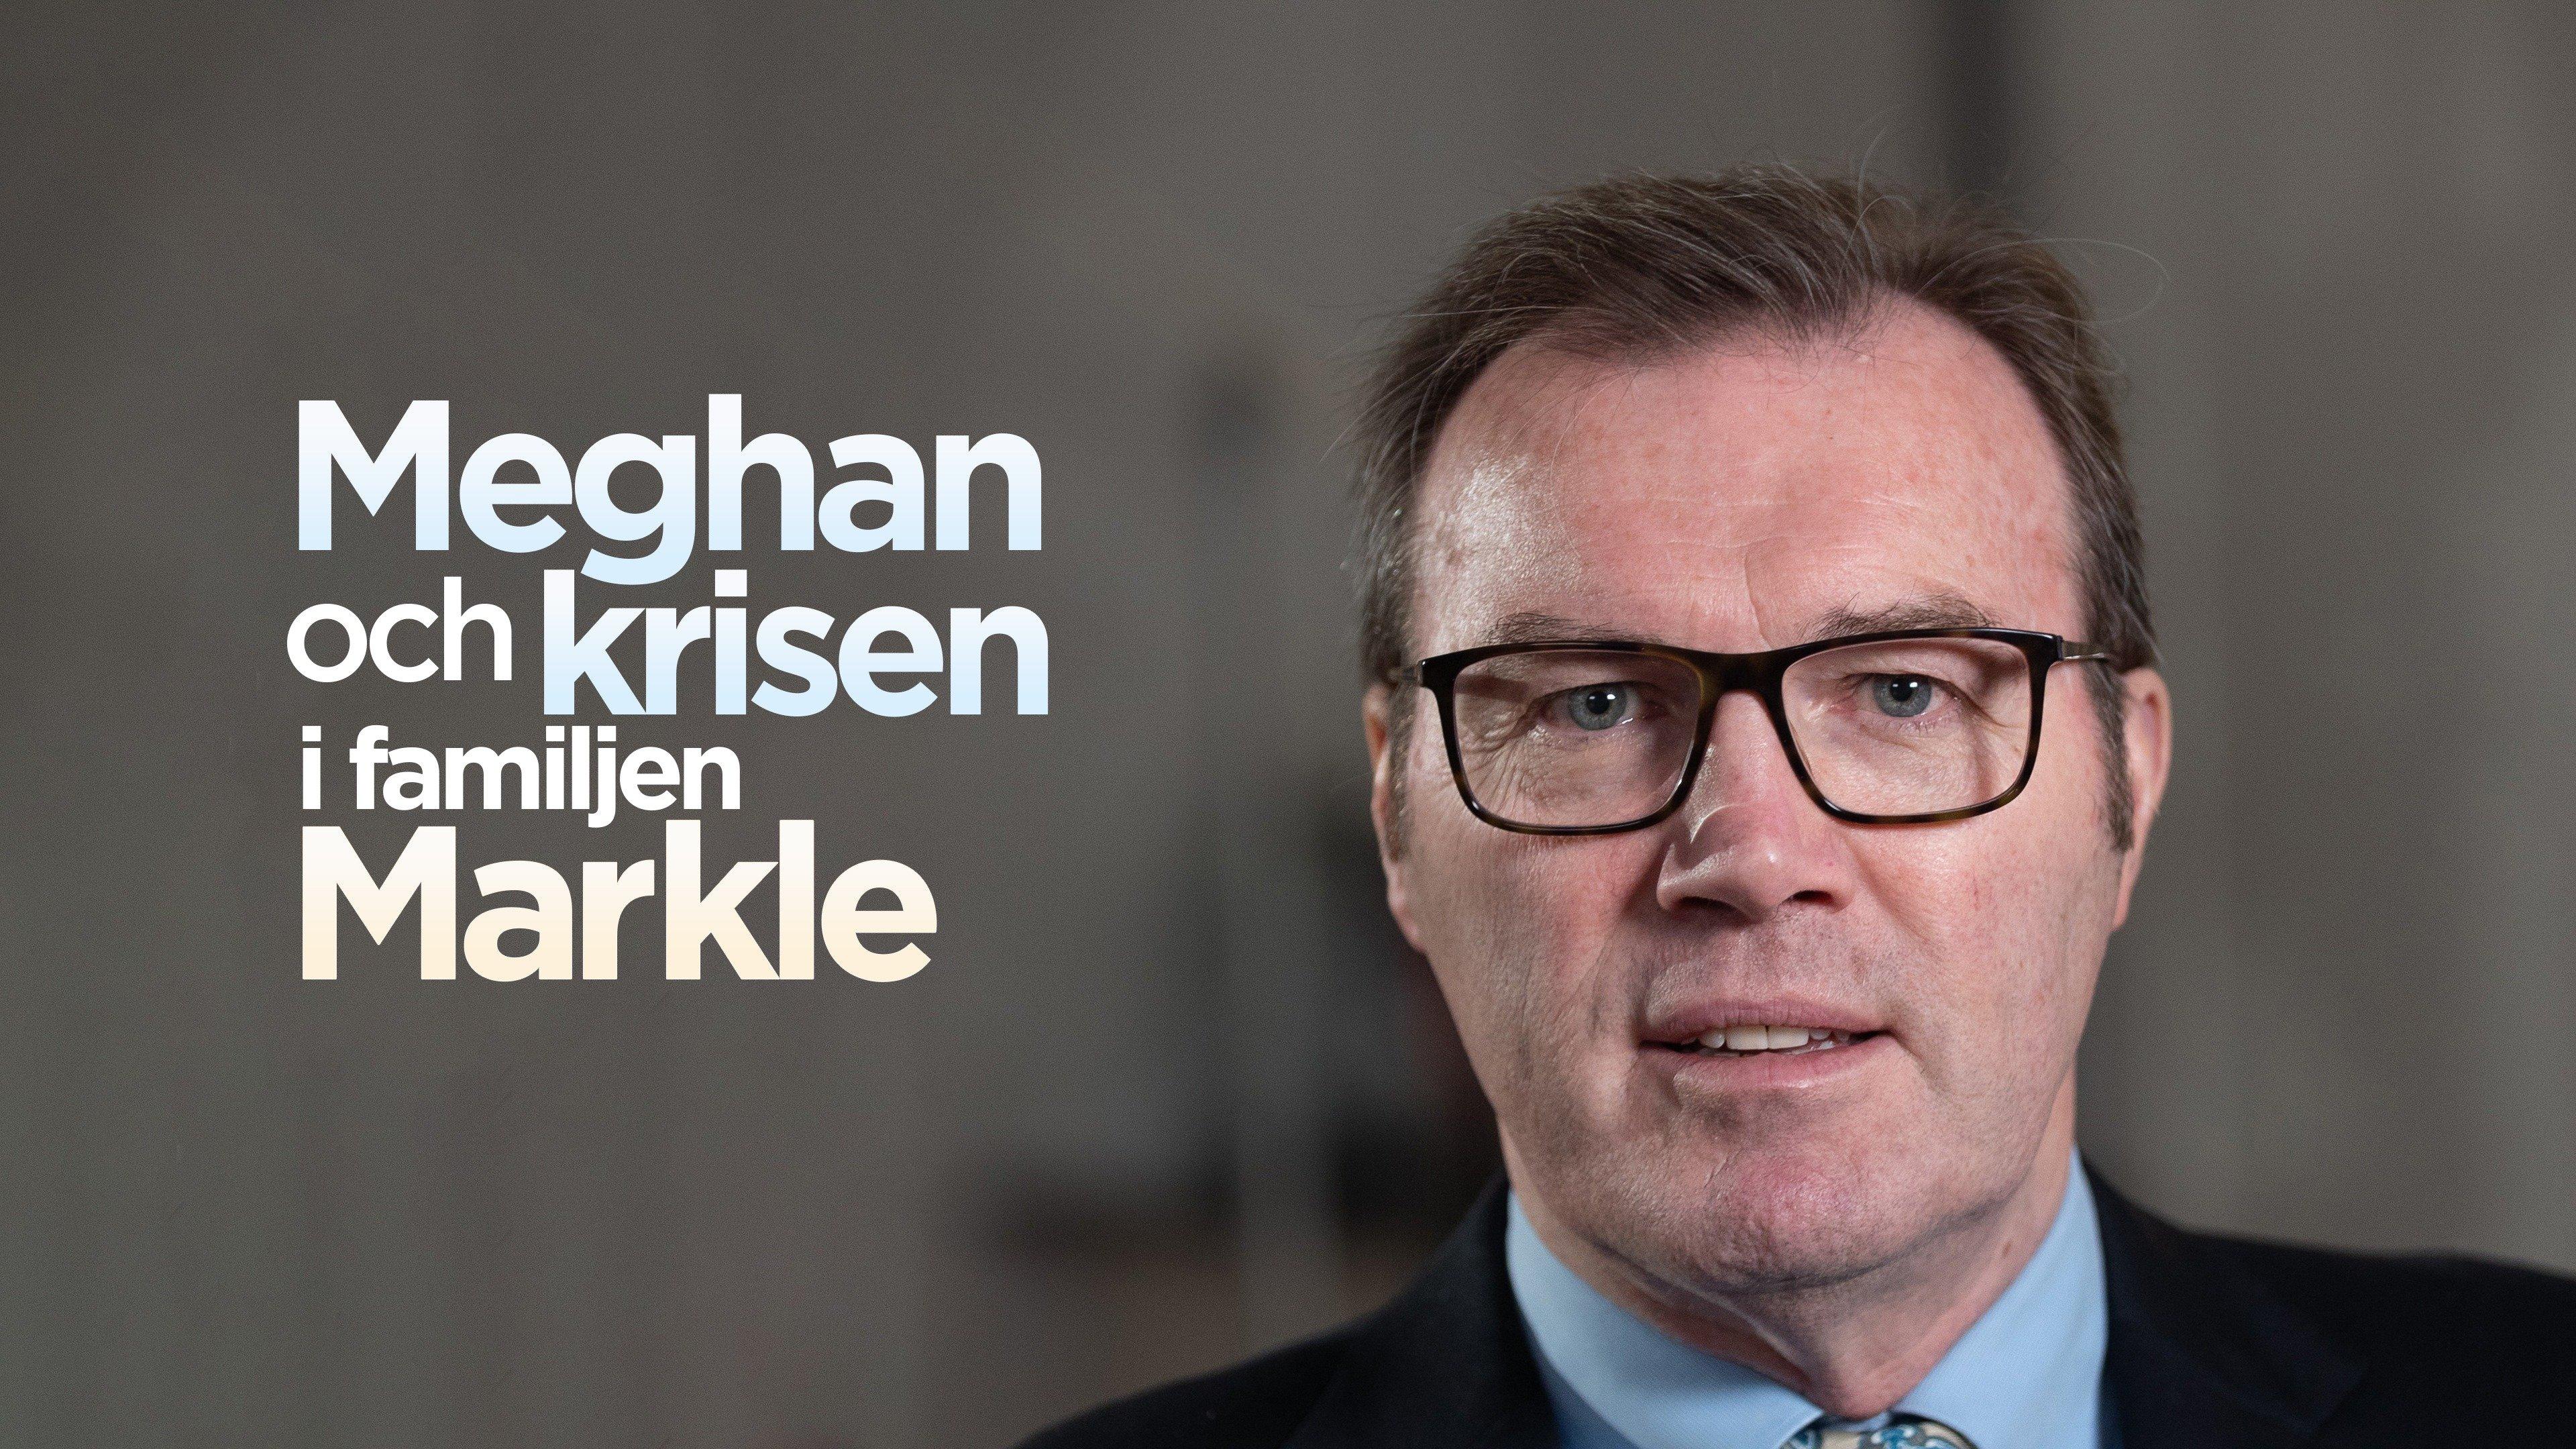 Meghan och krisen i familjen Markle